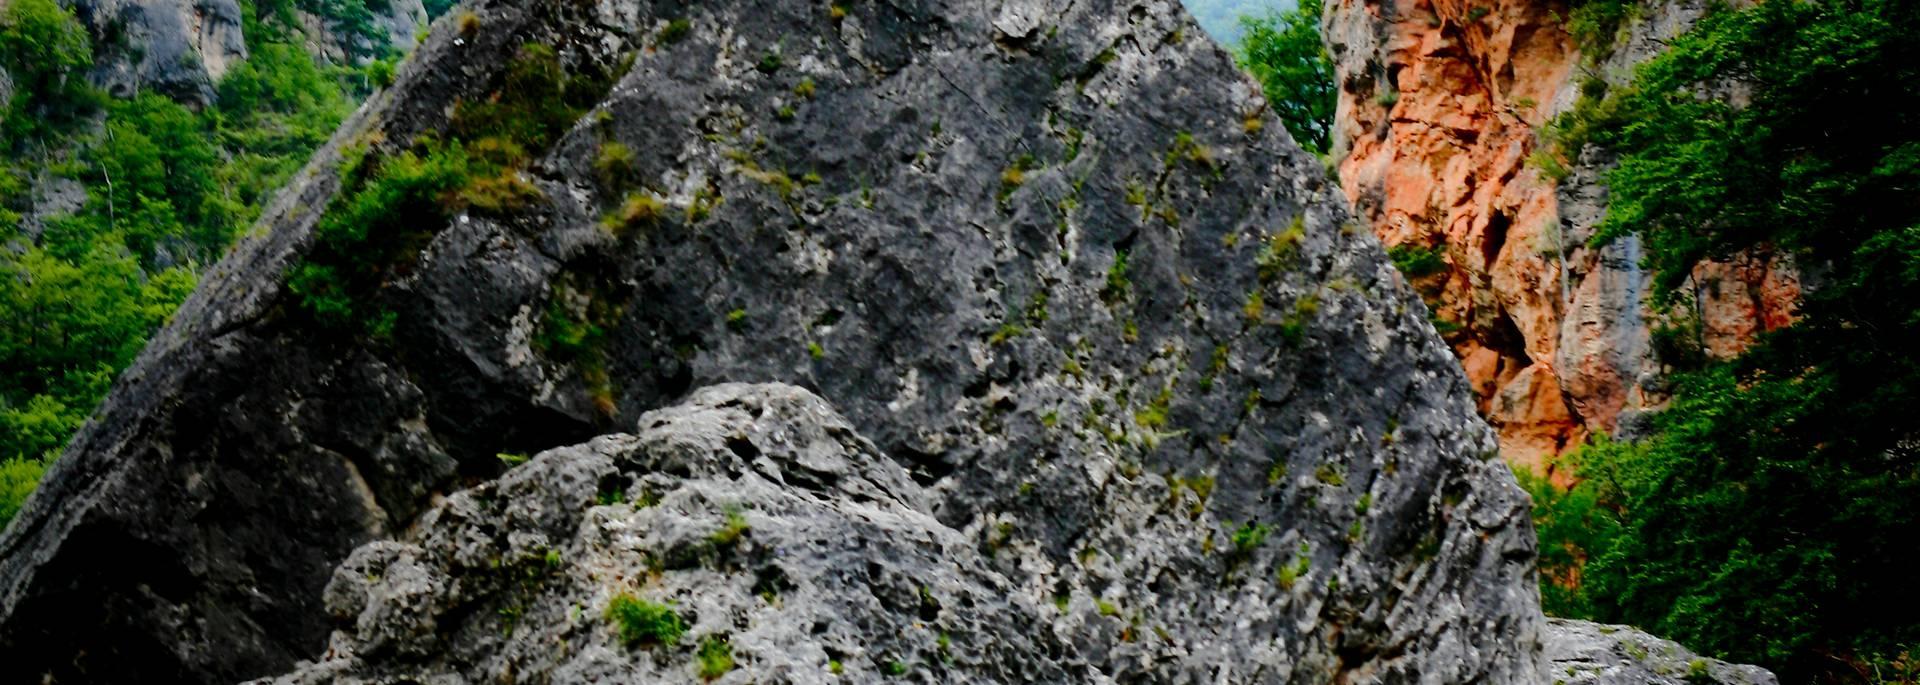 Escalade au Pas de soucy Gorges du Tarn